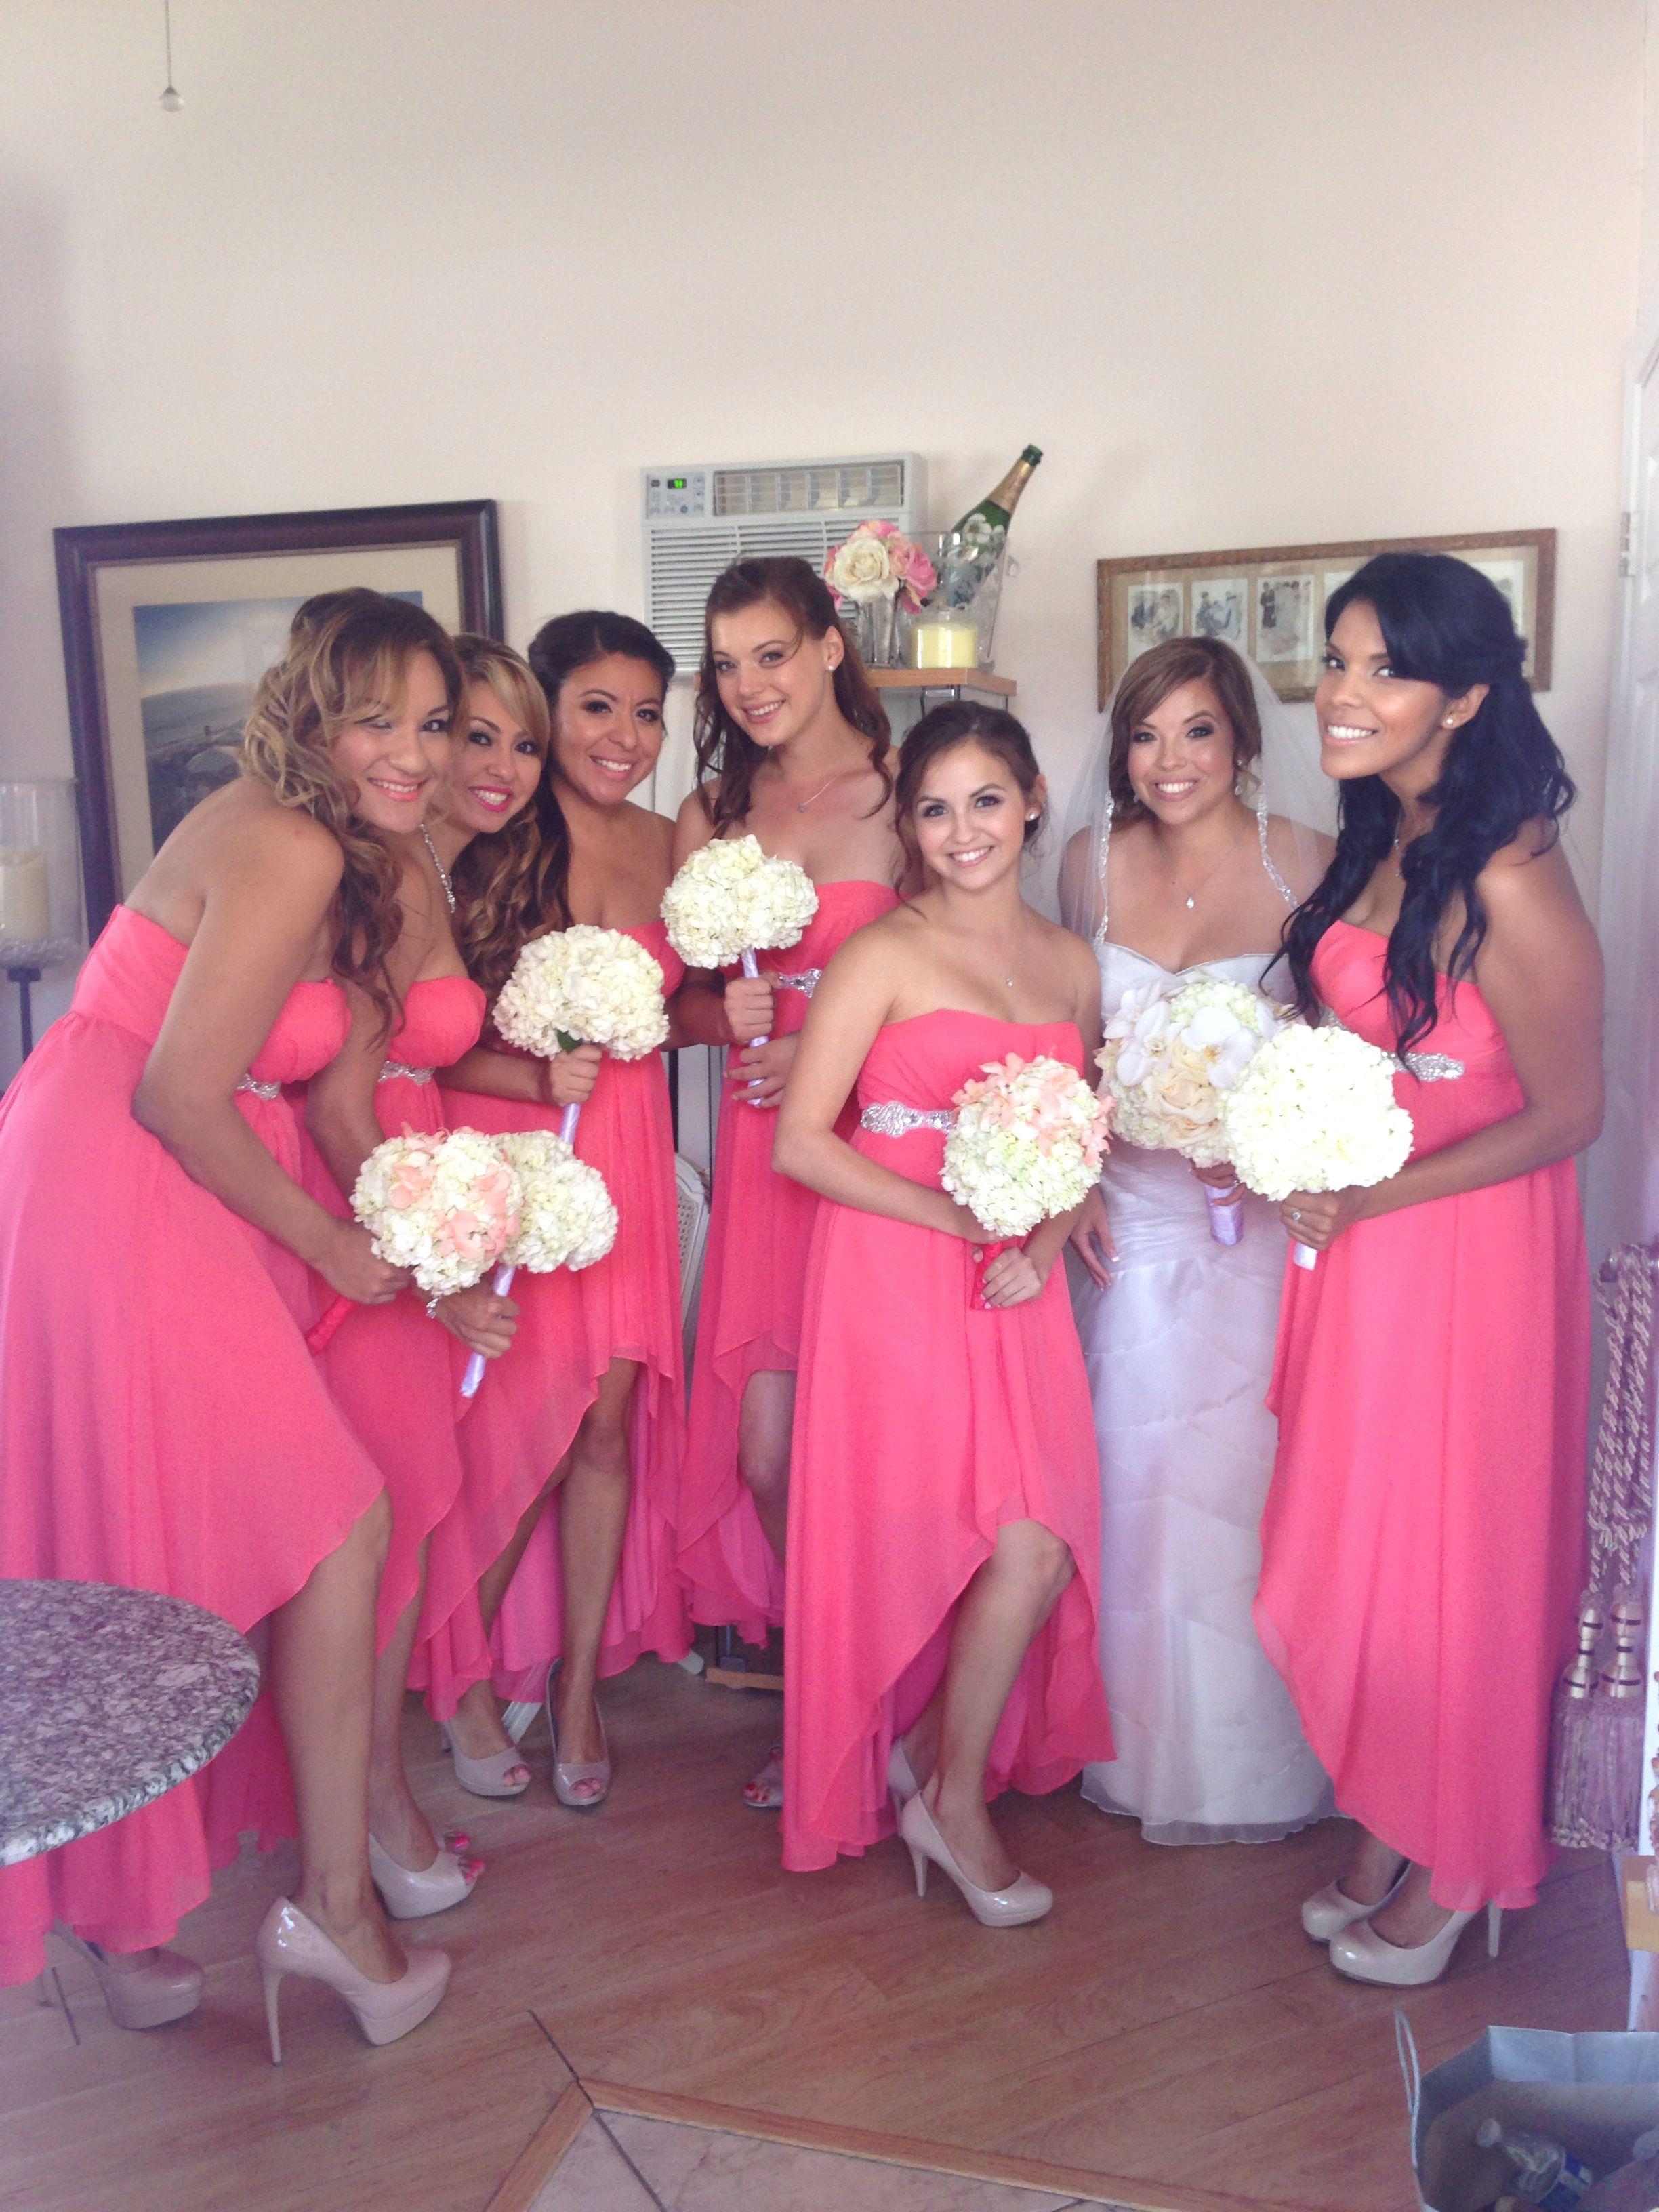 Coral bridesmaid dress .. Laguna beach wedding | My future wedding ...